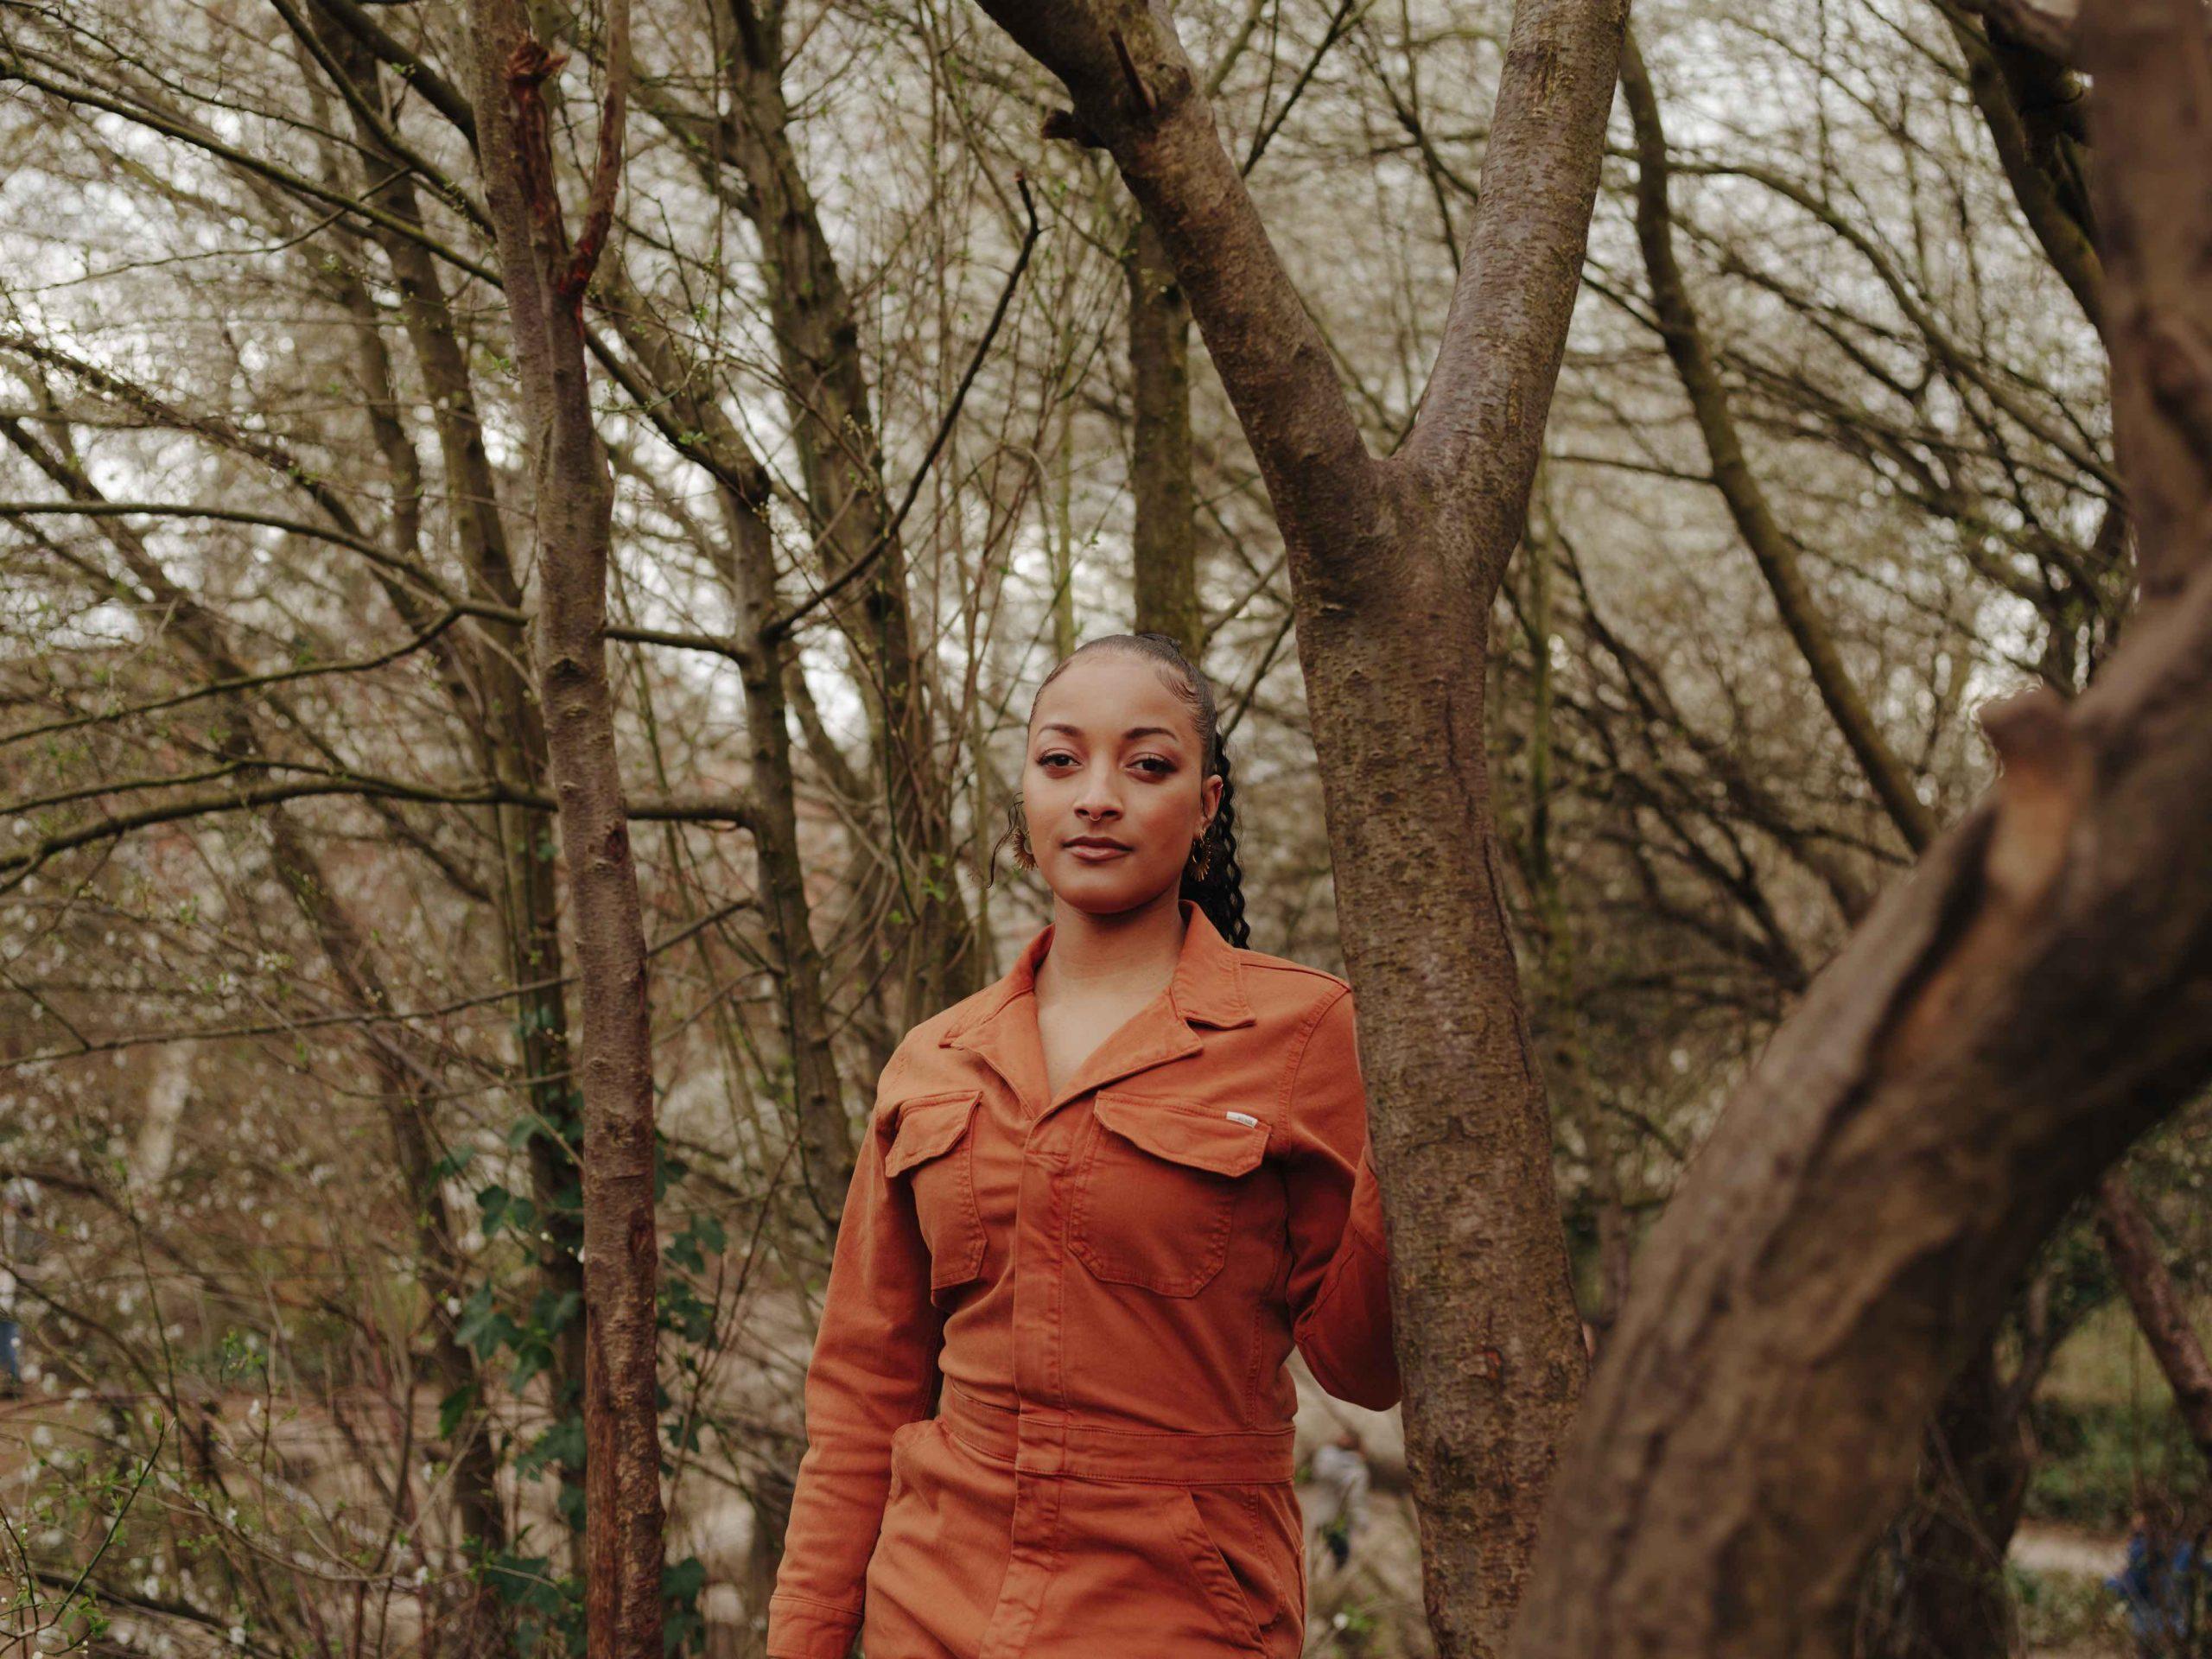 Nubya Garcia is a musician pushing the limits of genre